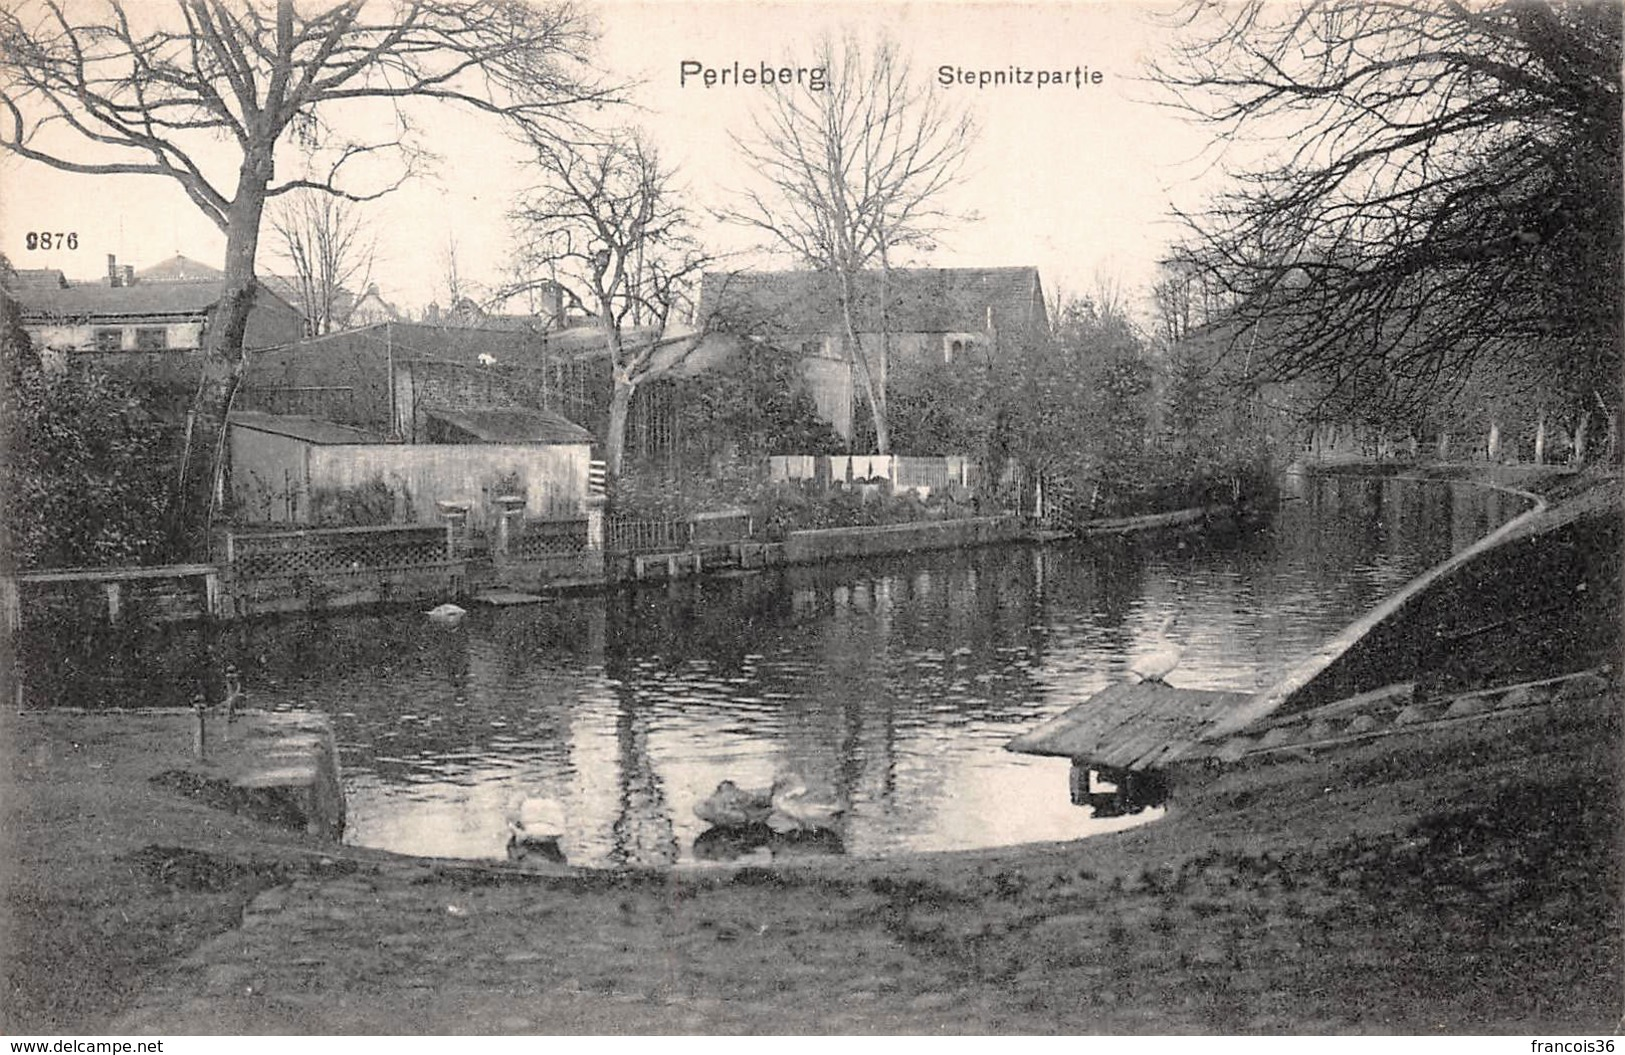 Allemagne - Perleberg - Stepnitzpartie - Perleberg